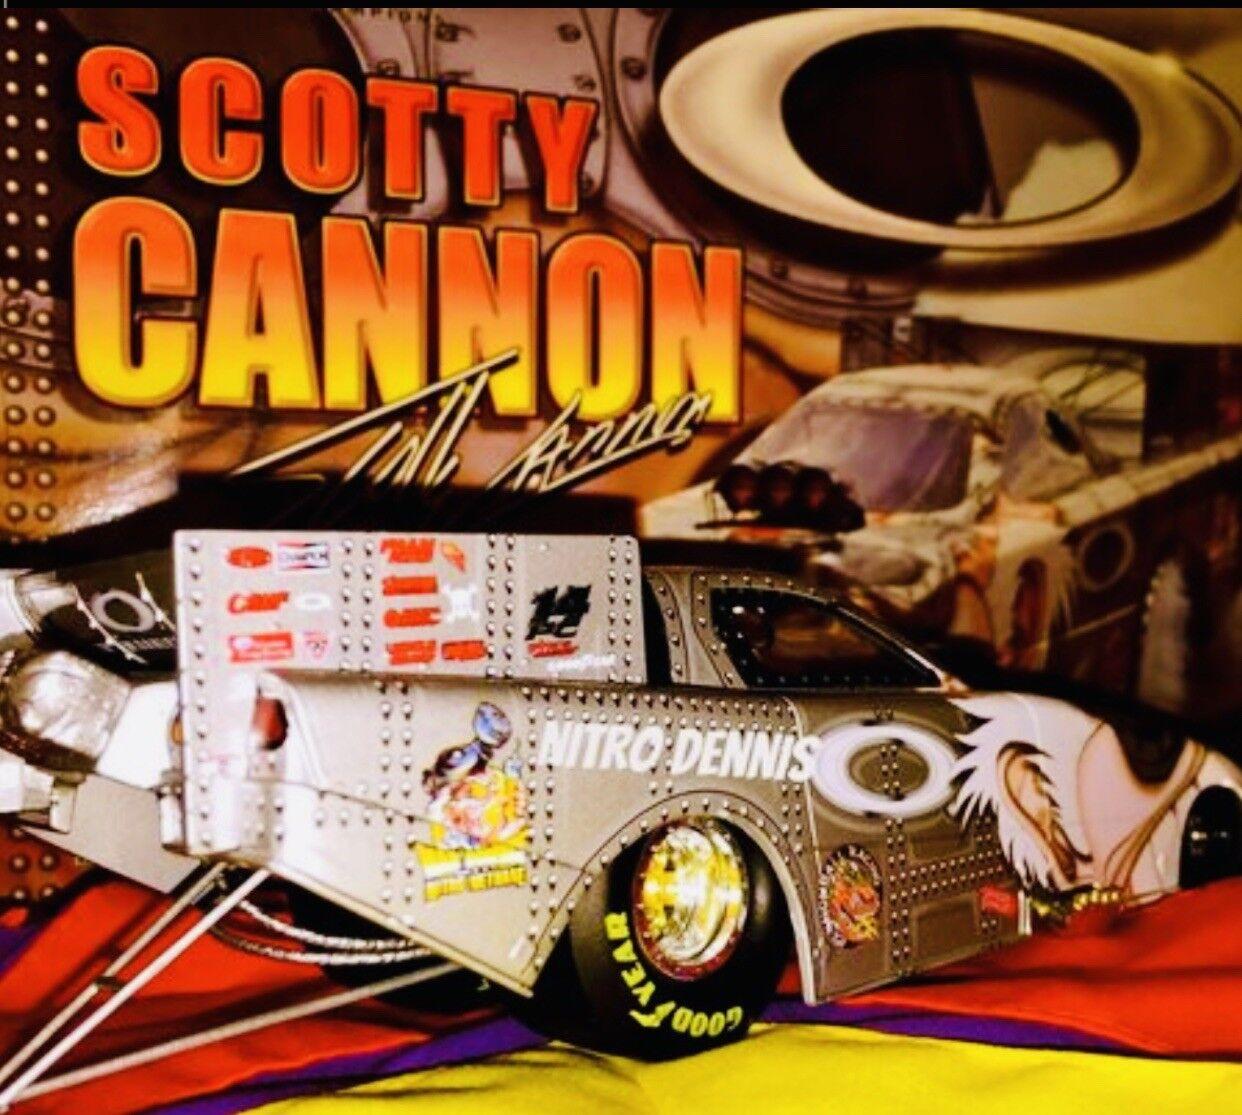 National Hot Rod Association Scotty Cannon 1 24 Diecast Nitro Lunettes Drôle Voiture Action Drag Racing